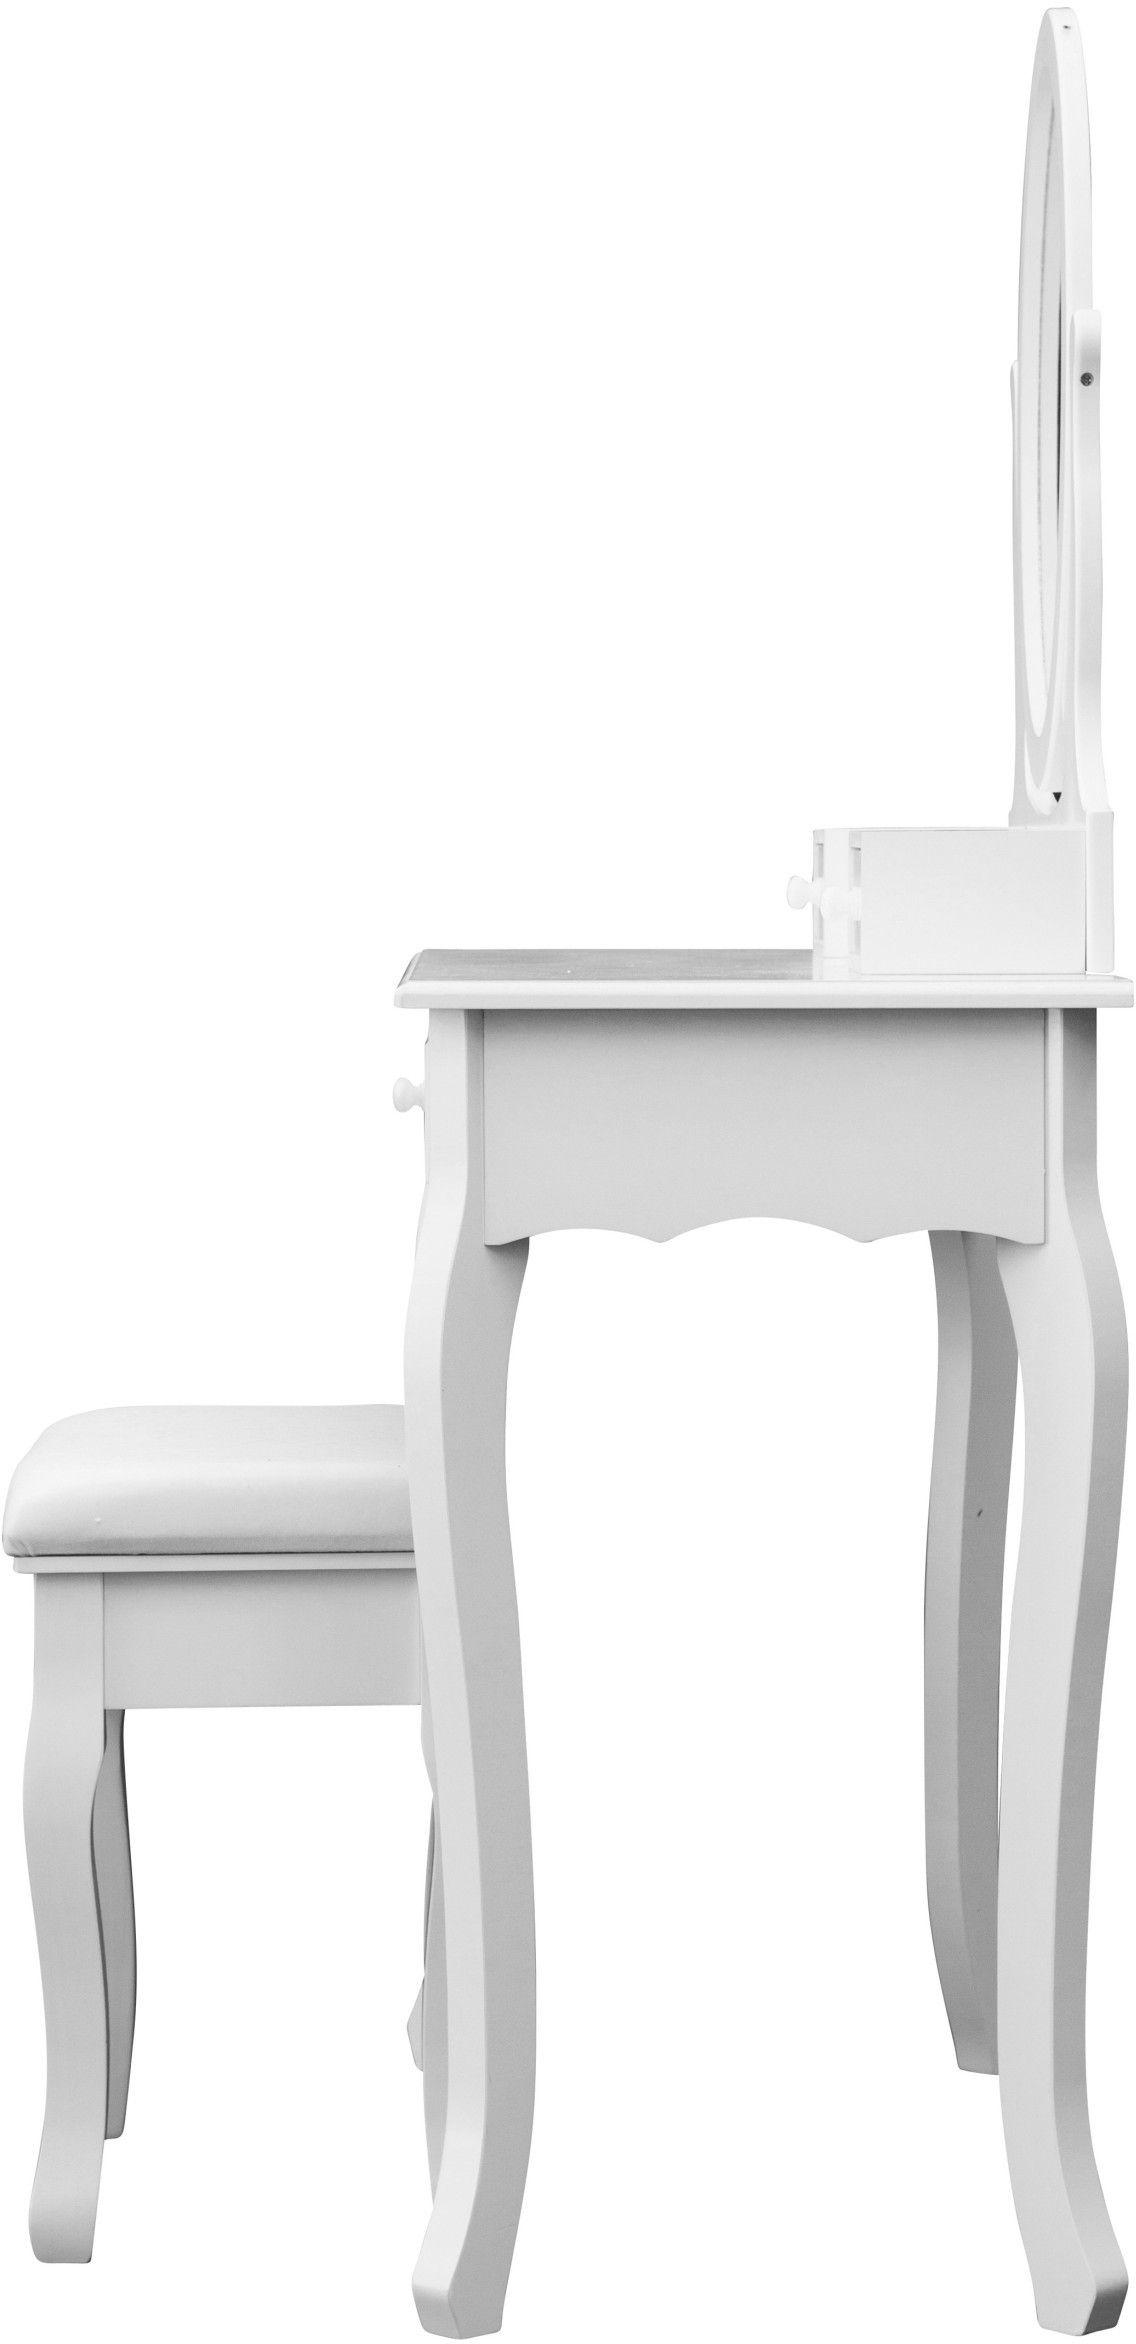 model 012 03